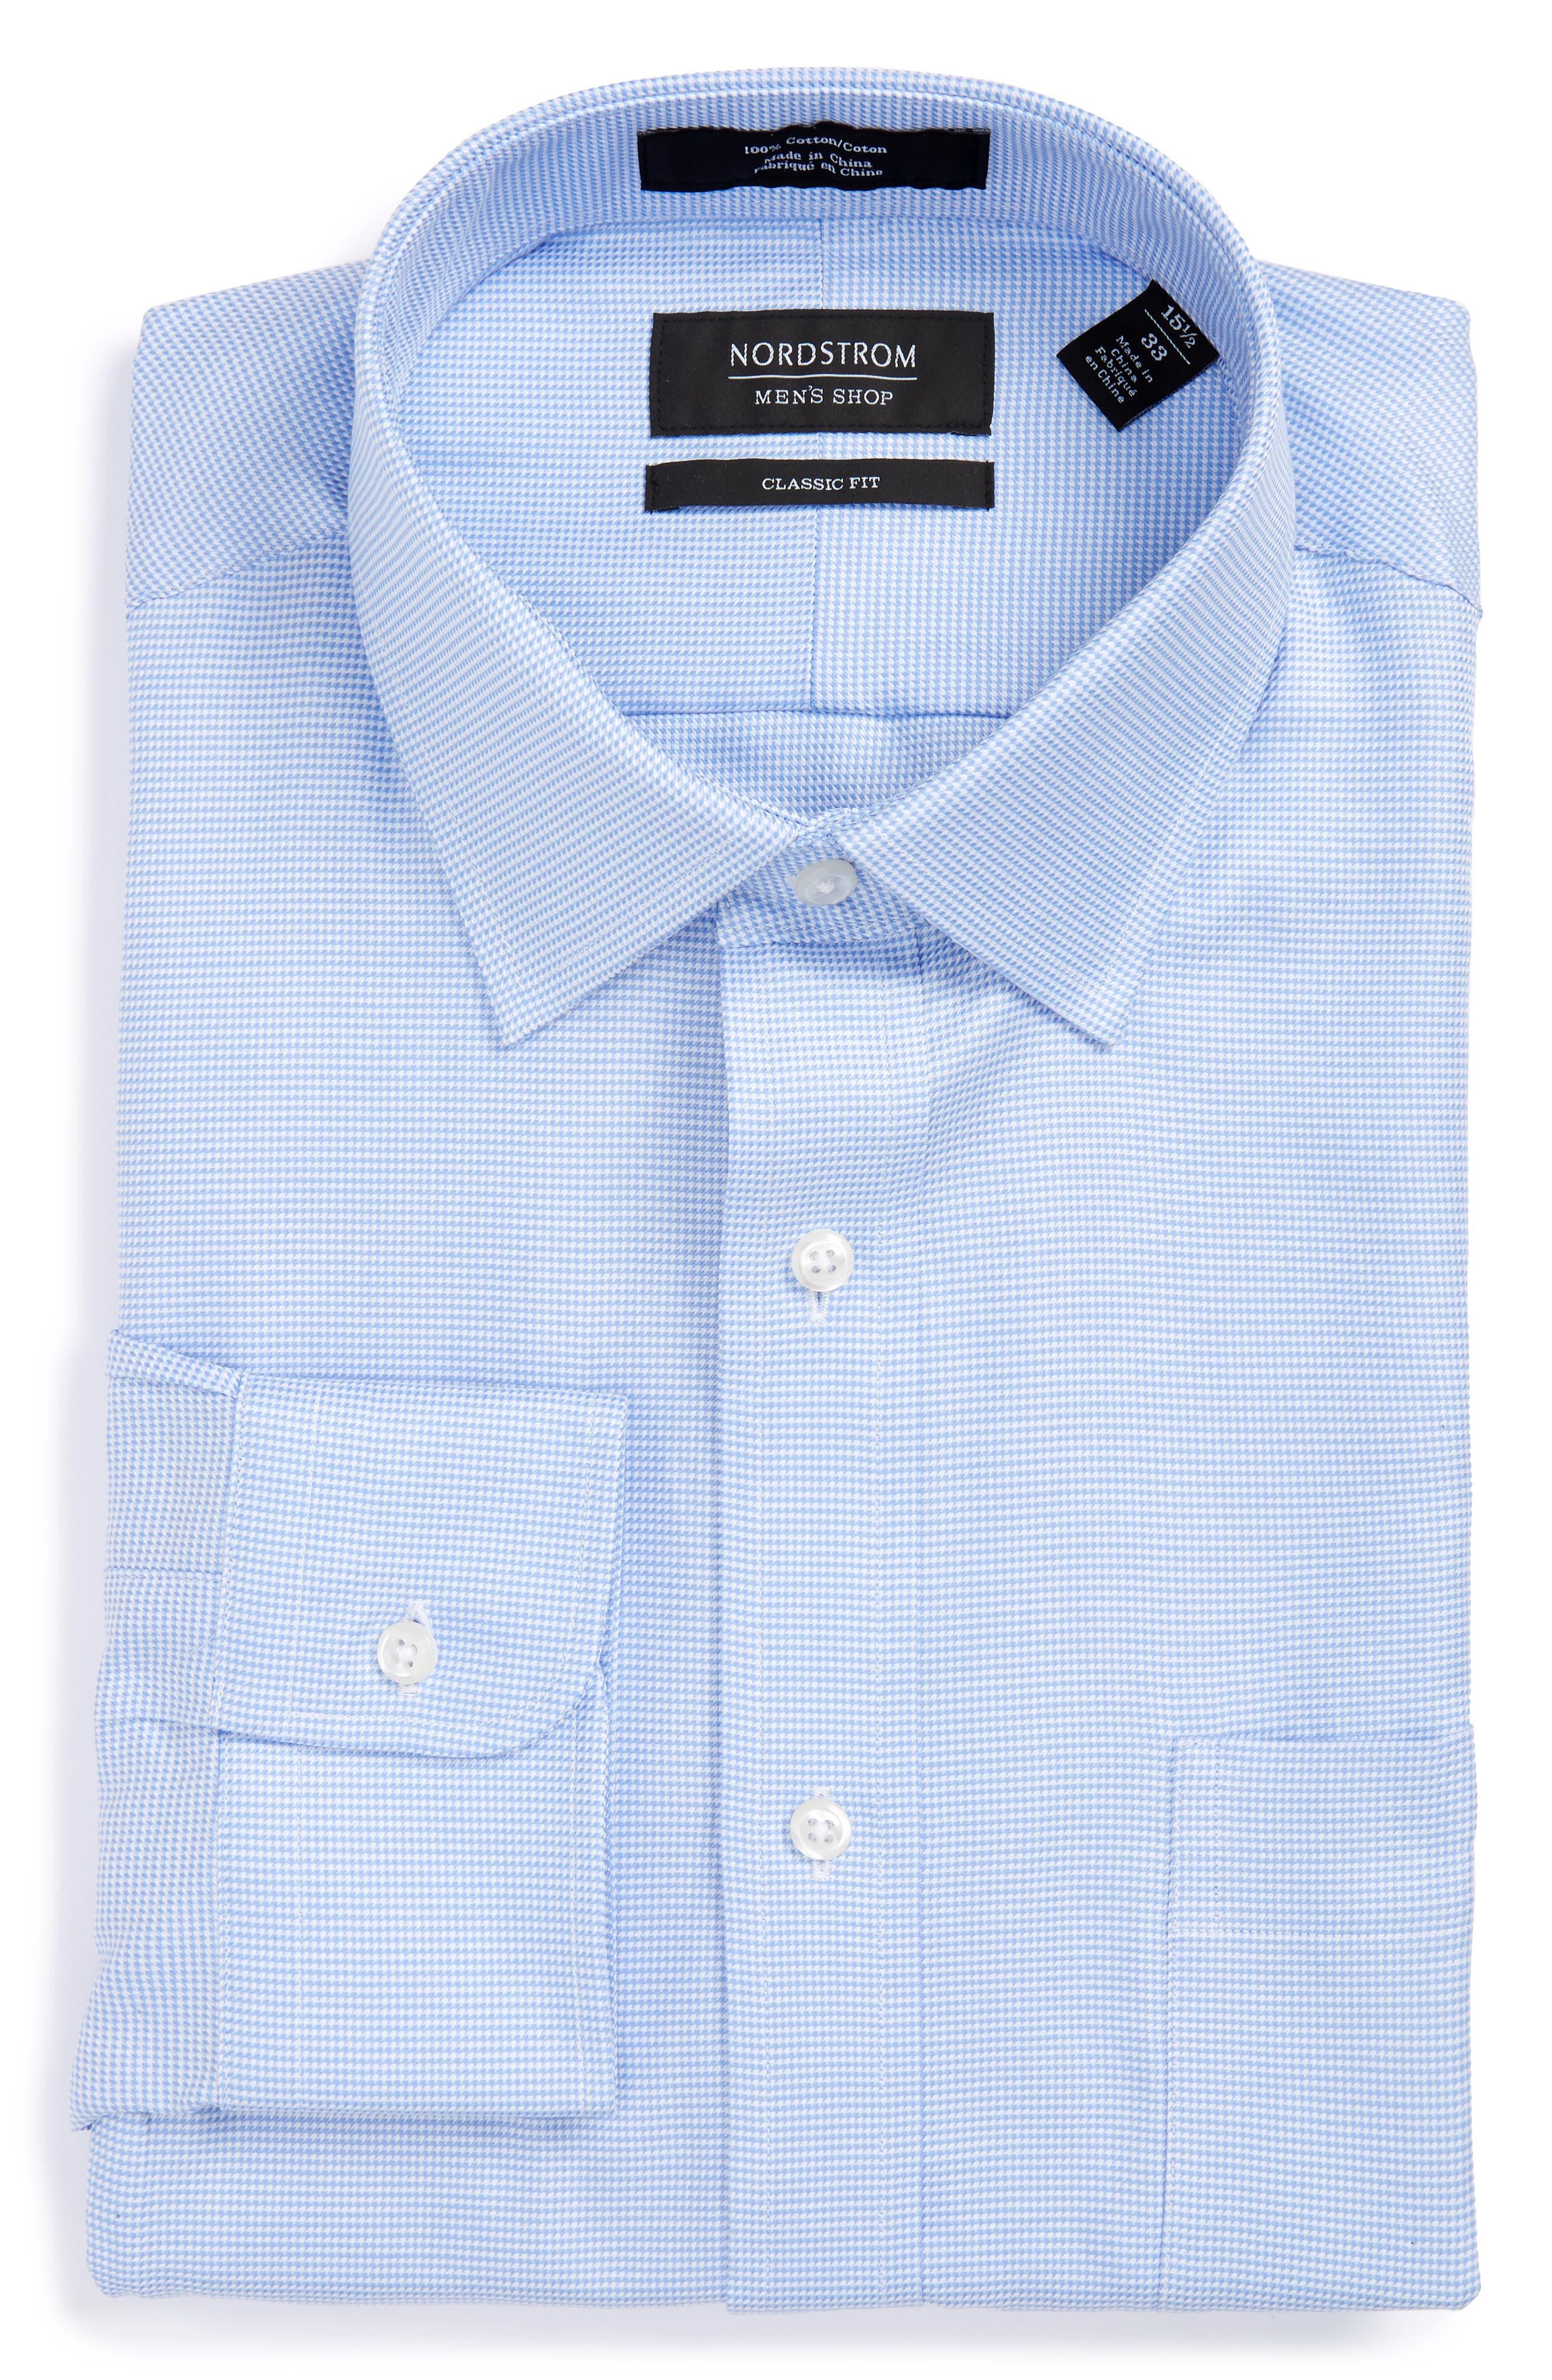 NORDSTROM MEN'S SHOP, Classic Fit Microgrid Dress Shirt, Alternate thumbnail 3, color, BLUE ROBIN